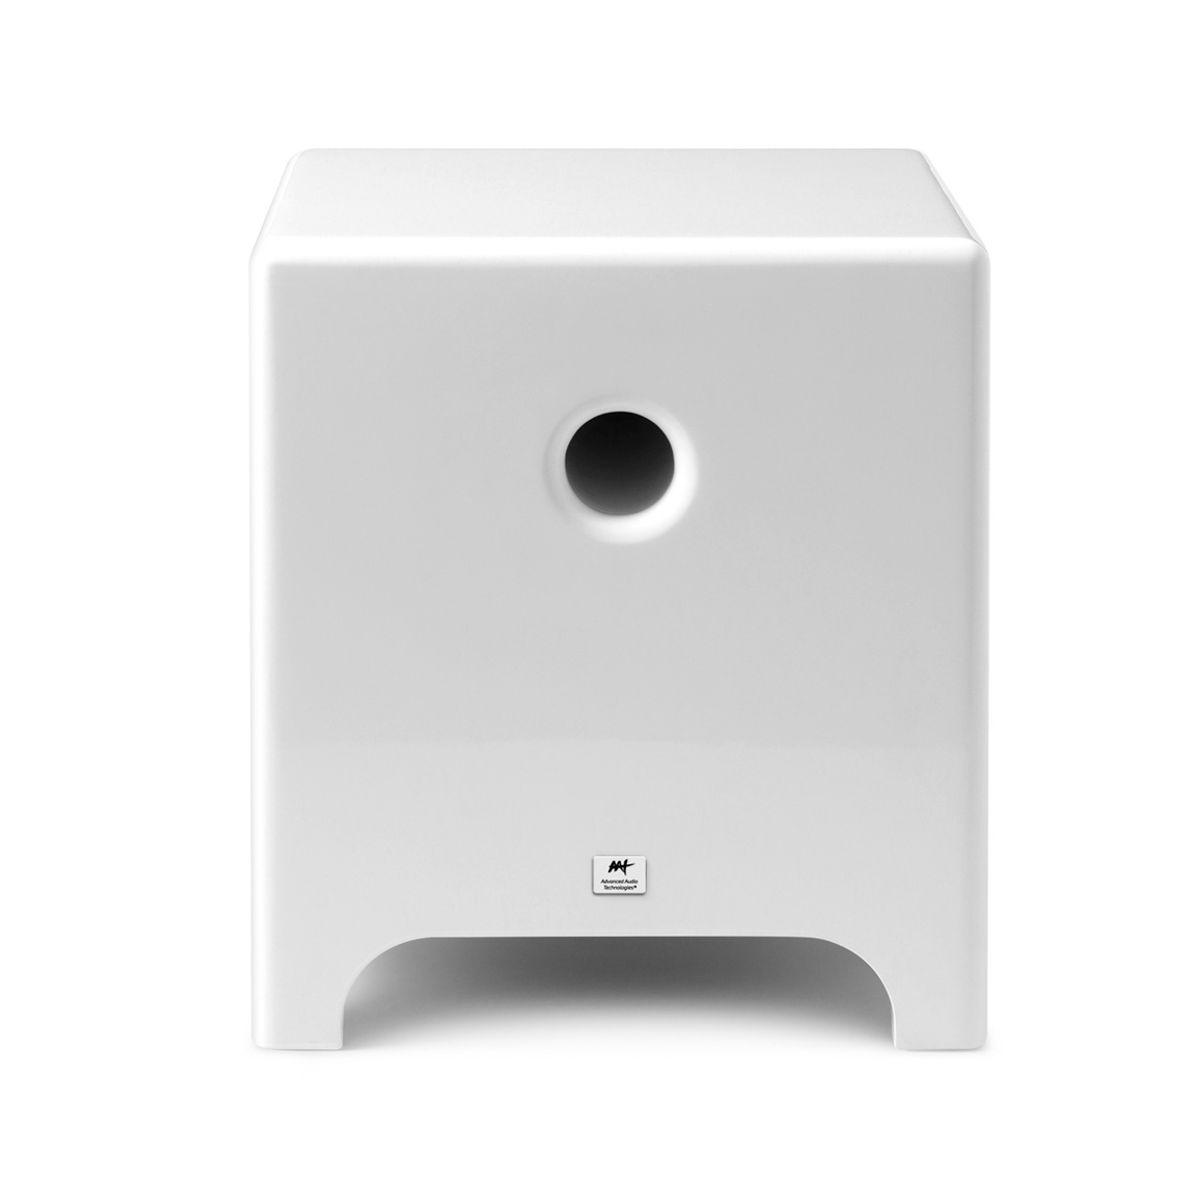 "Subwoofer Wireless Ativo Cube Modern 8"" 400W RMS AAT"